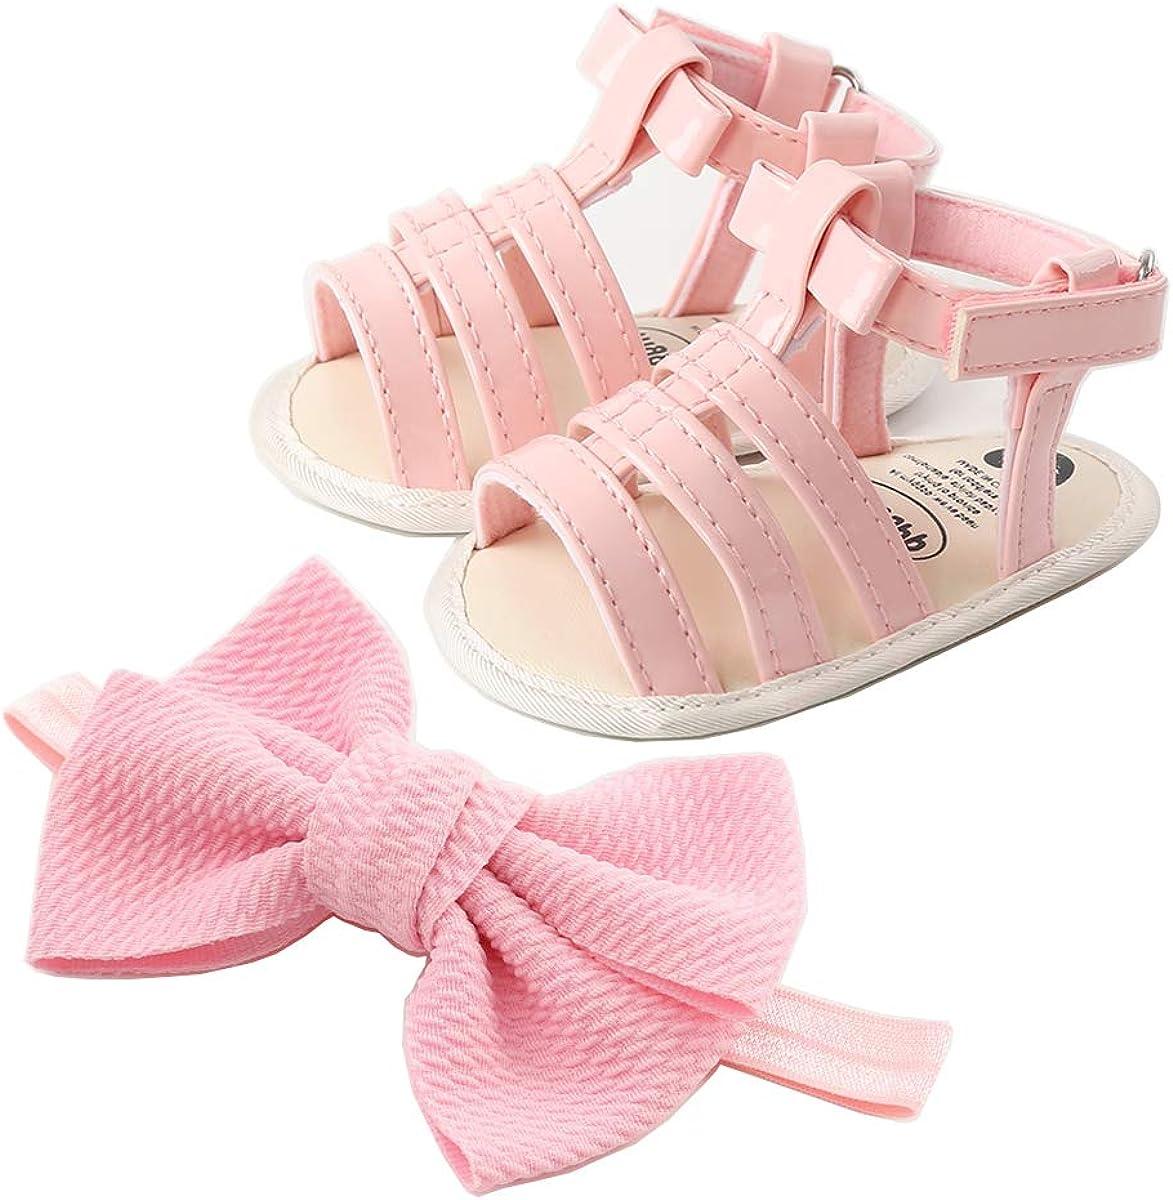 BEBARFER Infant Baby Girls Summer Sandals PU Leather Soft Anti-Slip Sole Cute Flower Toddler Crib First Walker Shoes